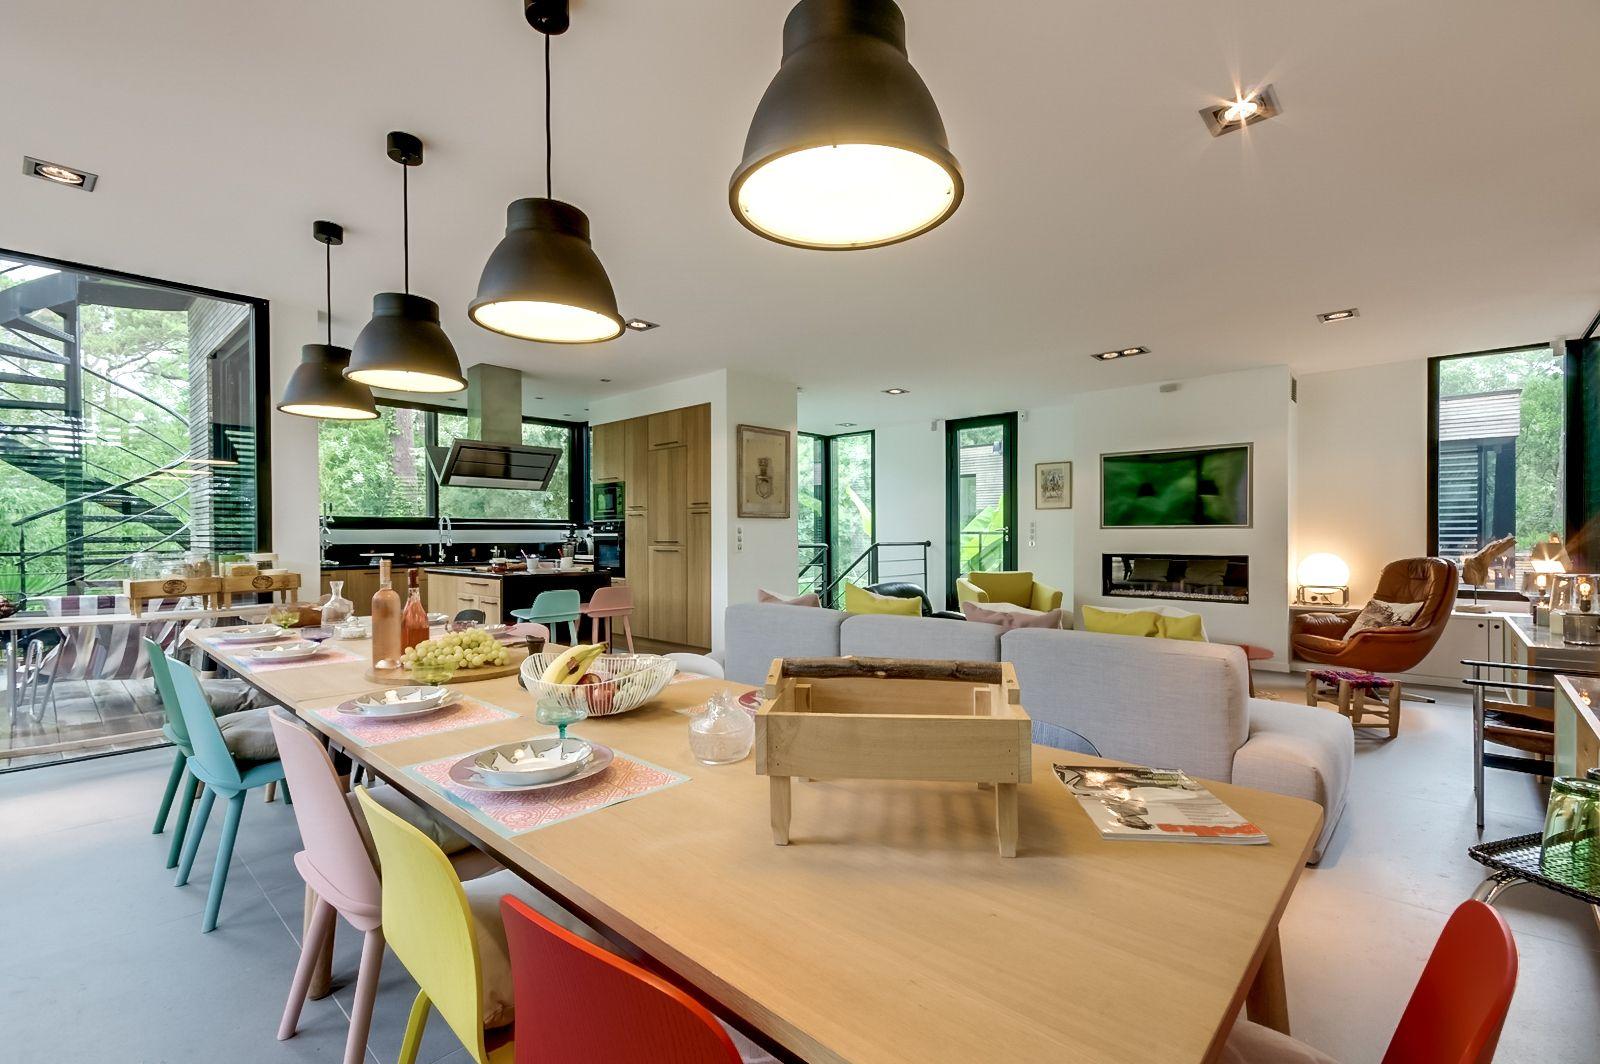 ralisation agence ccile kokocinski table de salle manger xxl